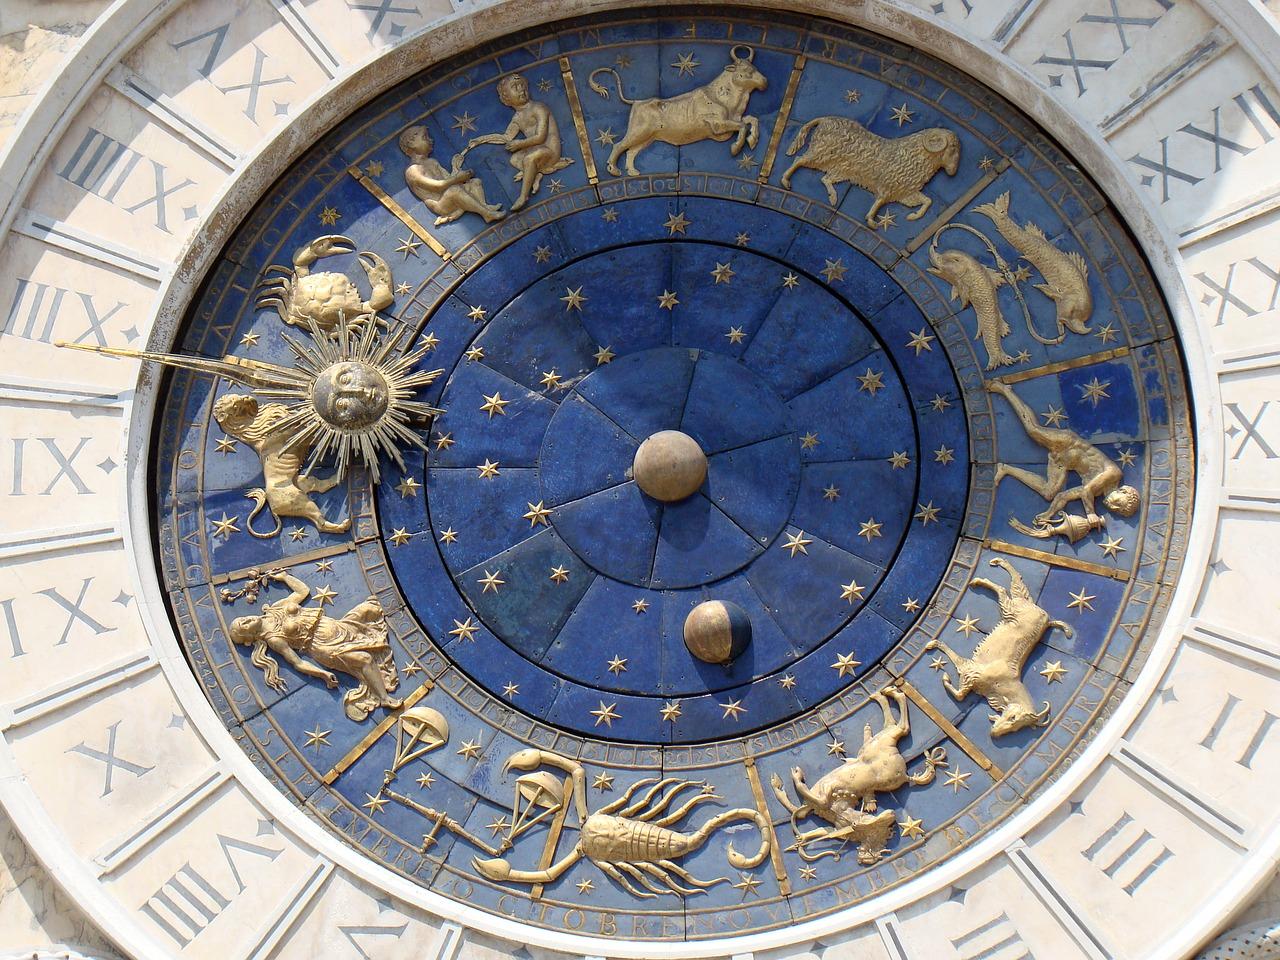 Tα ζώδια σήμερα 16 Μαρτίου: Ο Ερμής στους Ιχθείς φέρνει περίεργες αυταπάτες